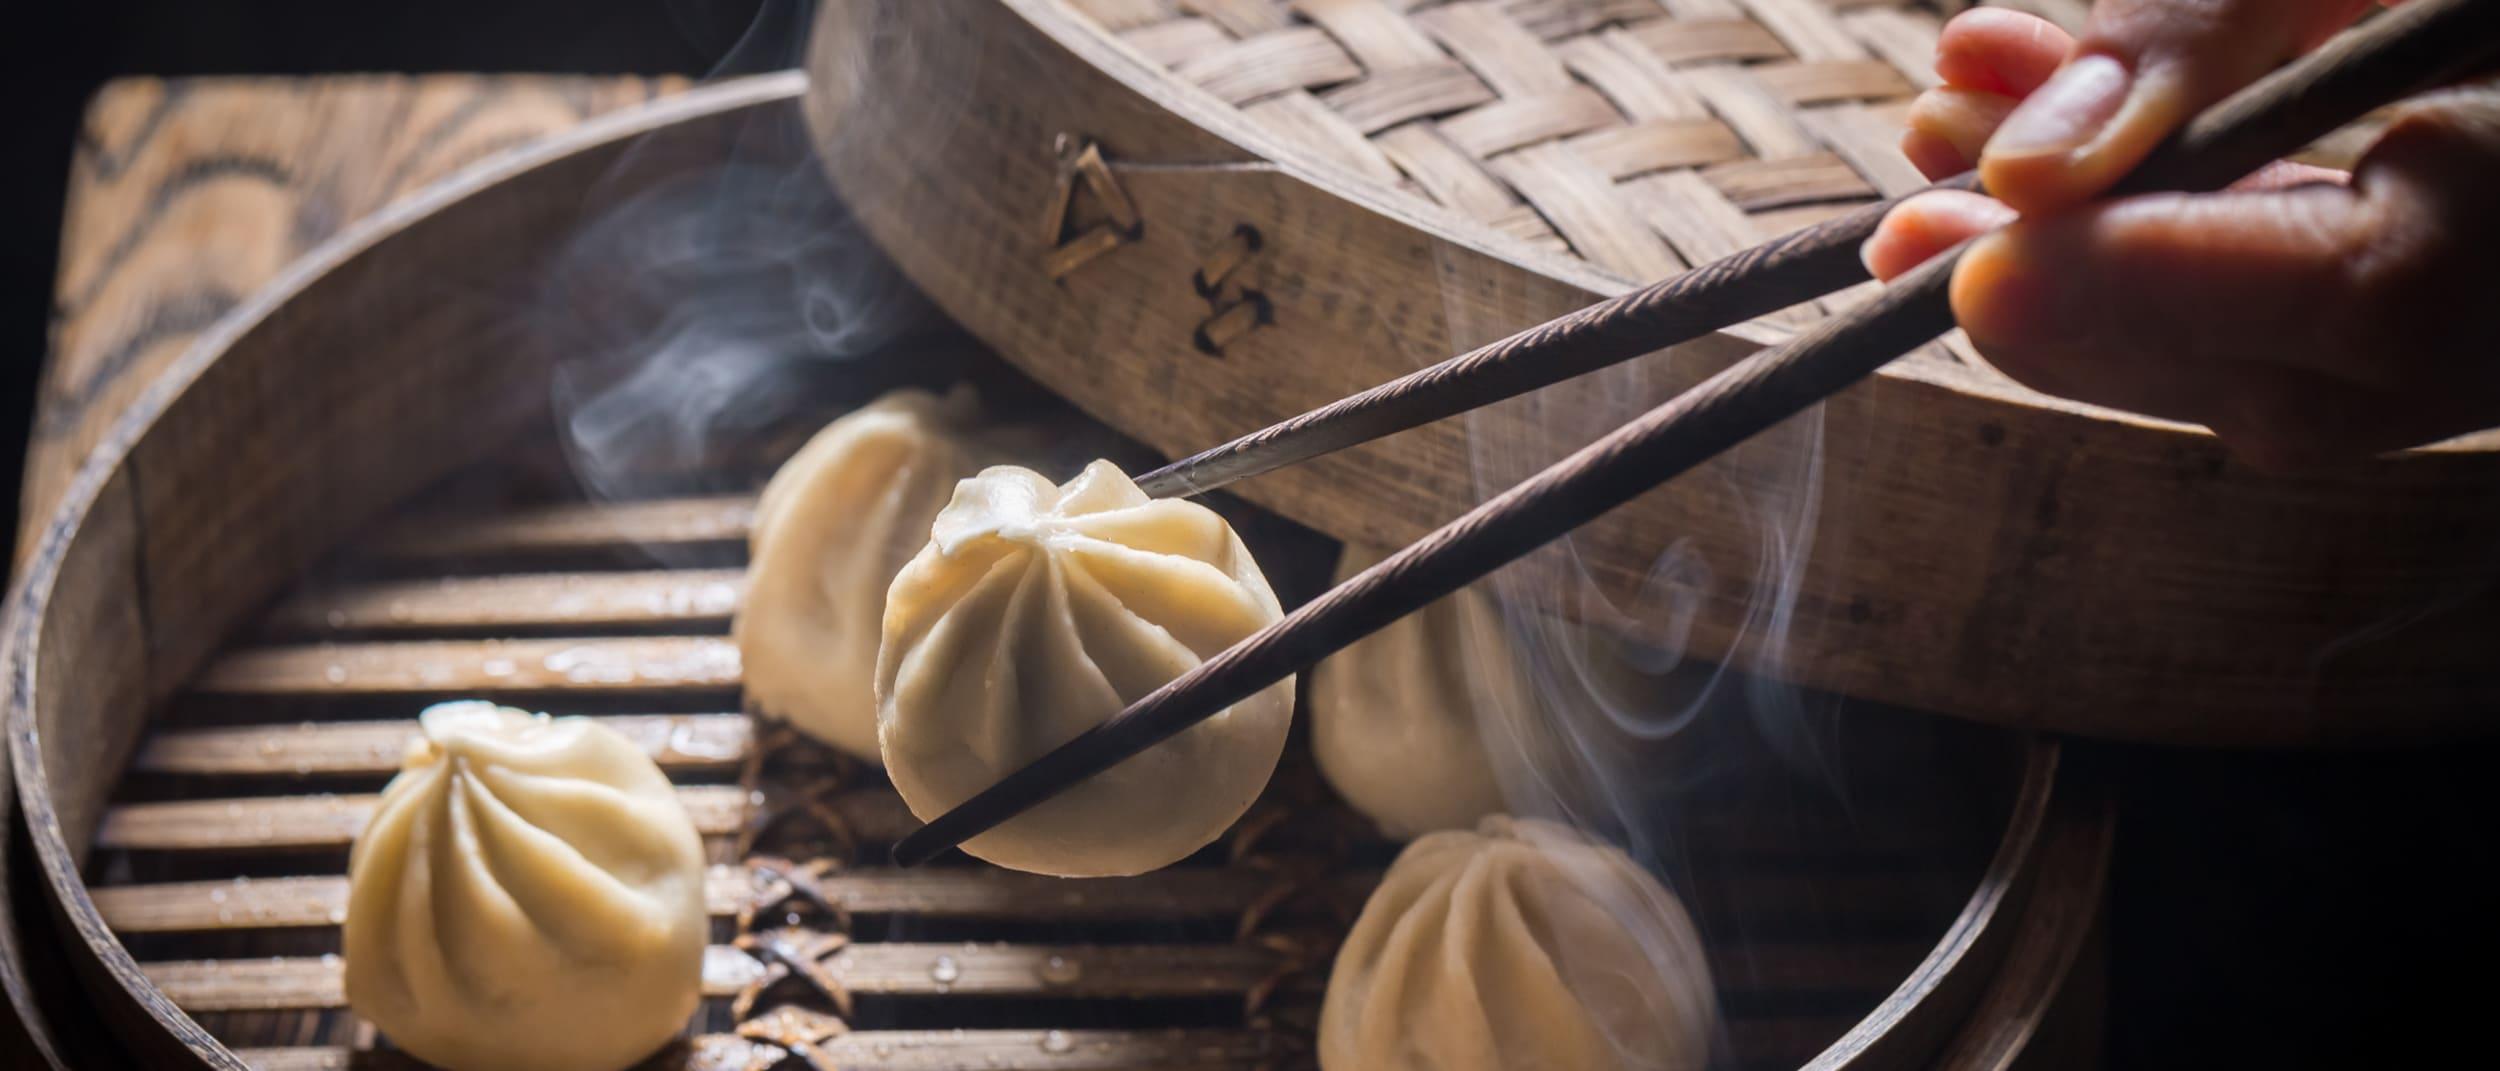 Little Red Dumplings: Mid-Week Banquet Special